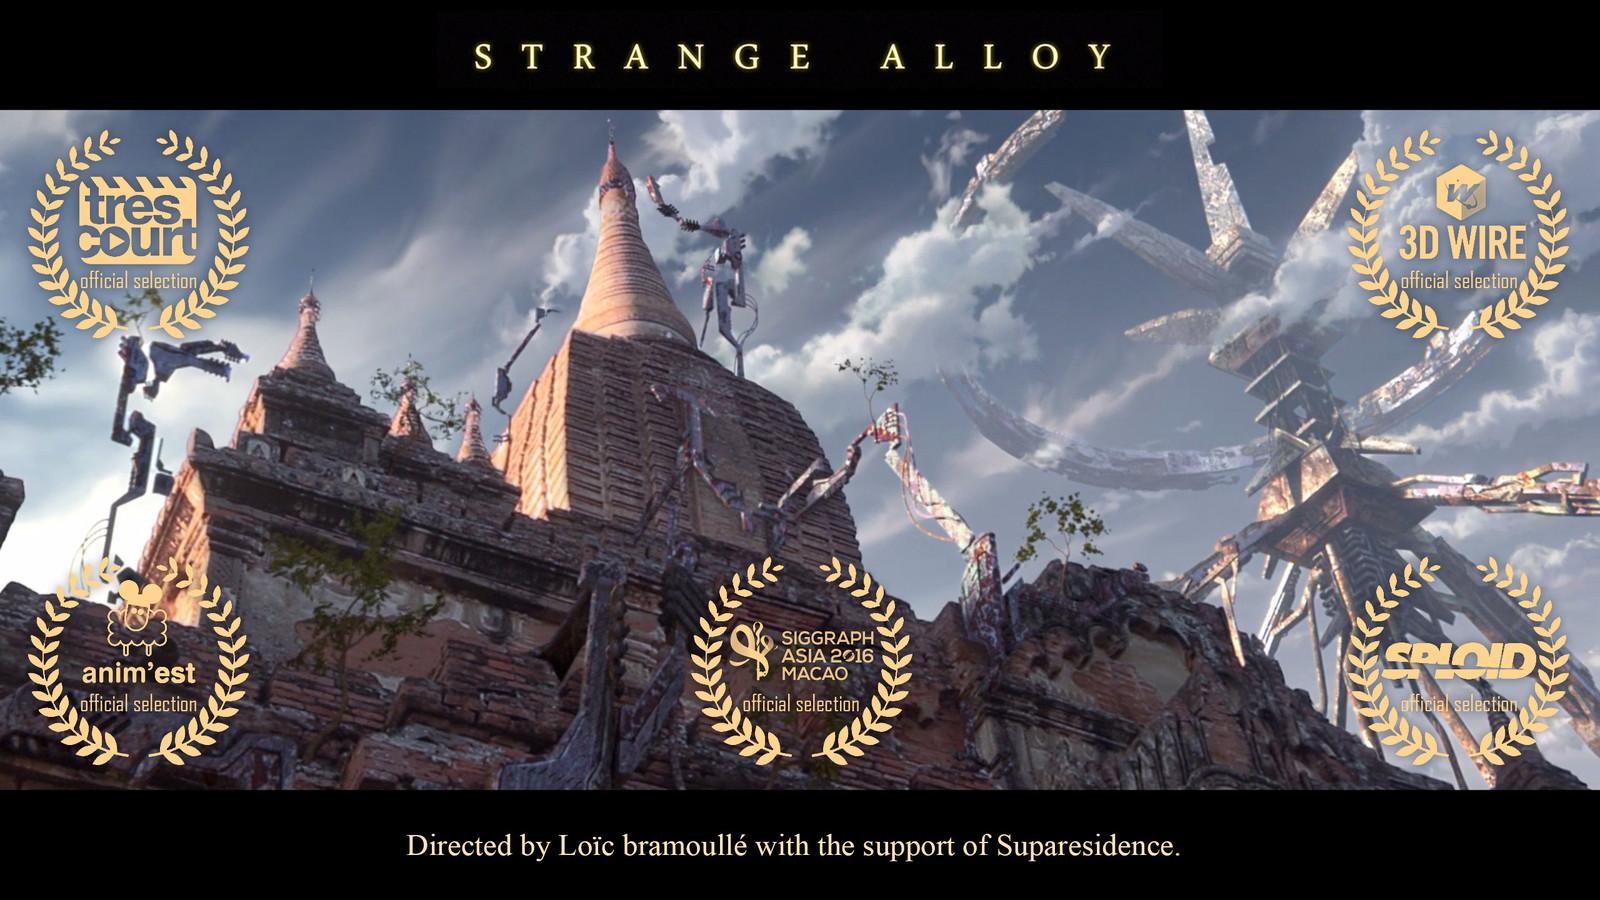 Strange alloy - indy short film